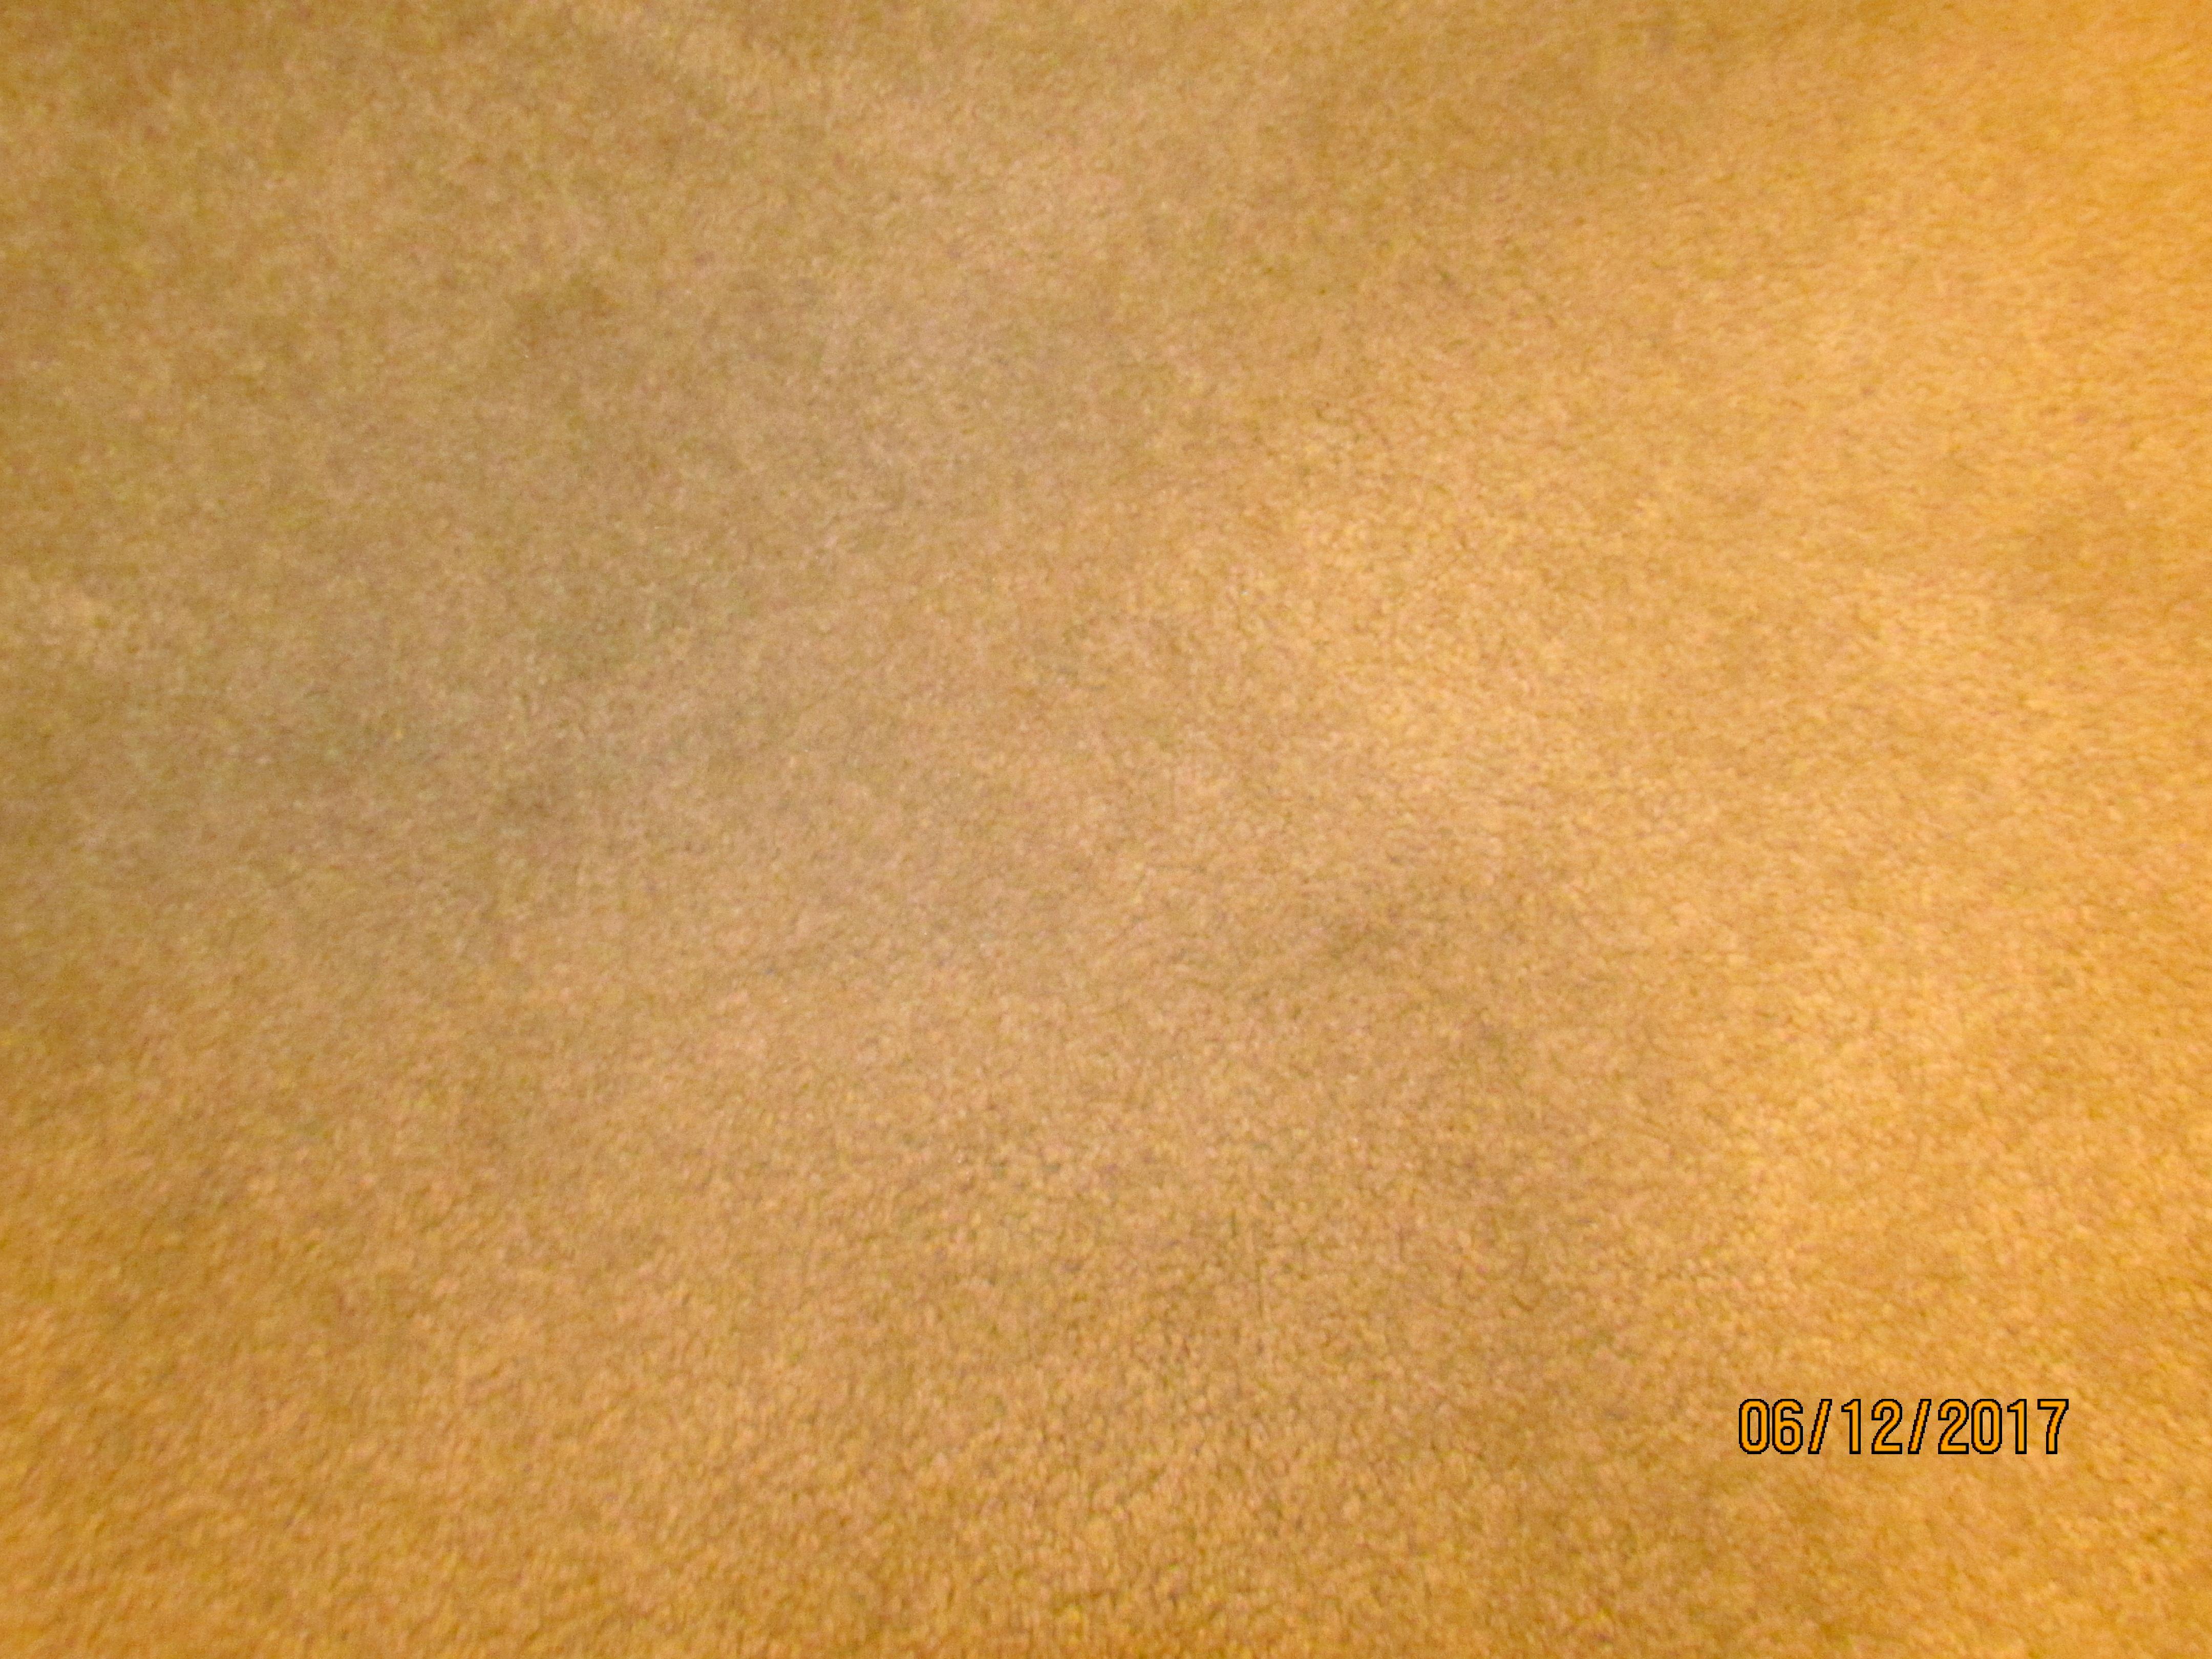 Teasdale Fenton Carpet Cleaning & Restoration Cincinnati, OH 45246 - YP.com